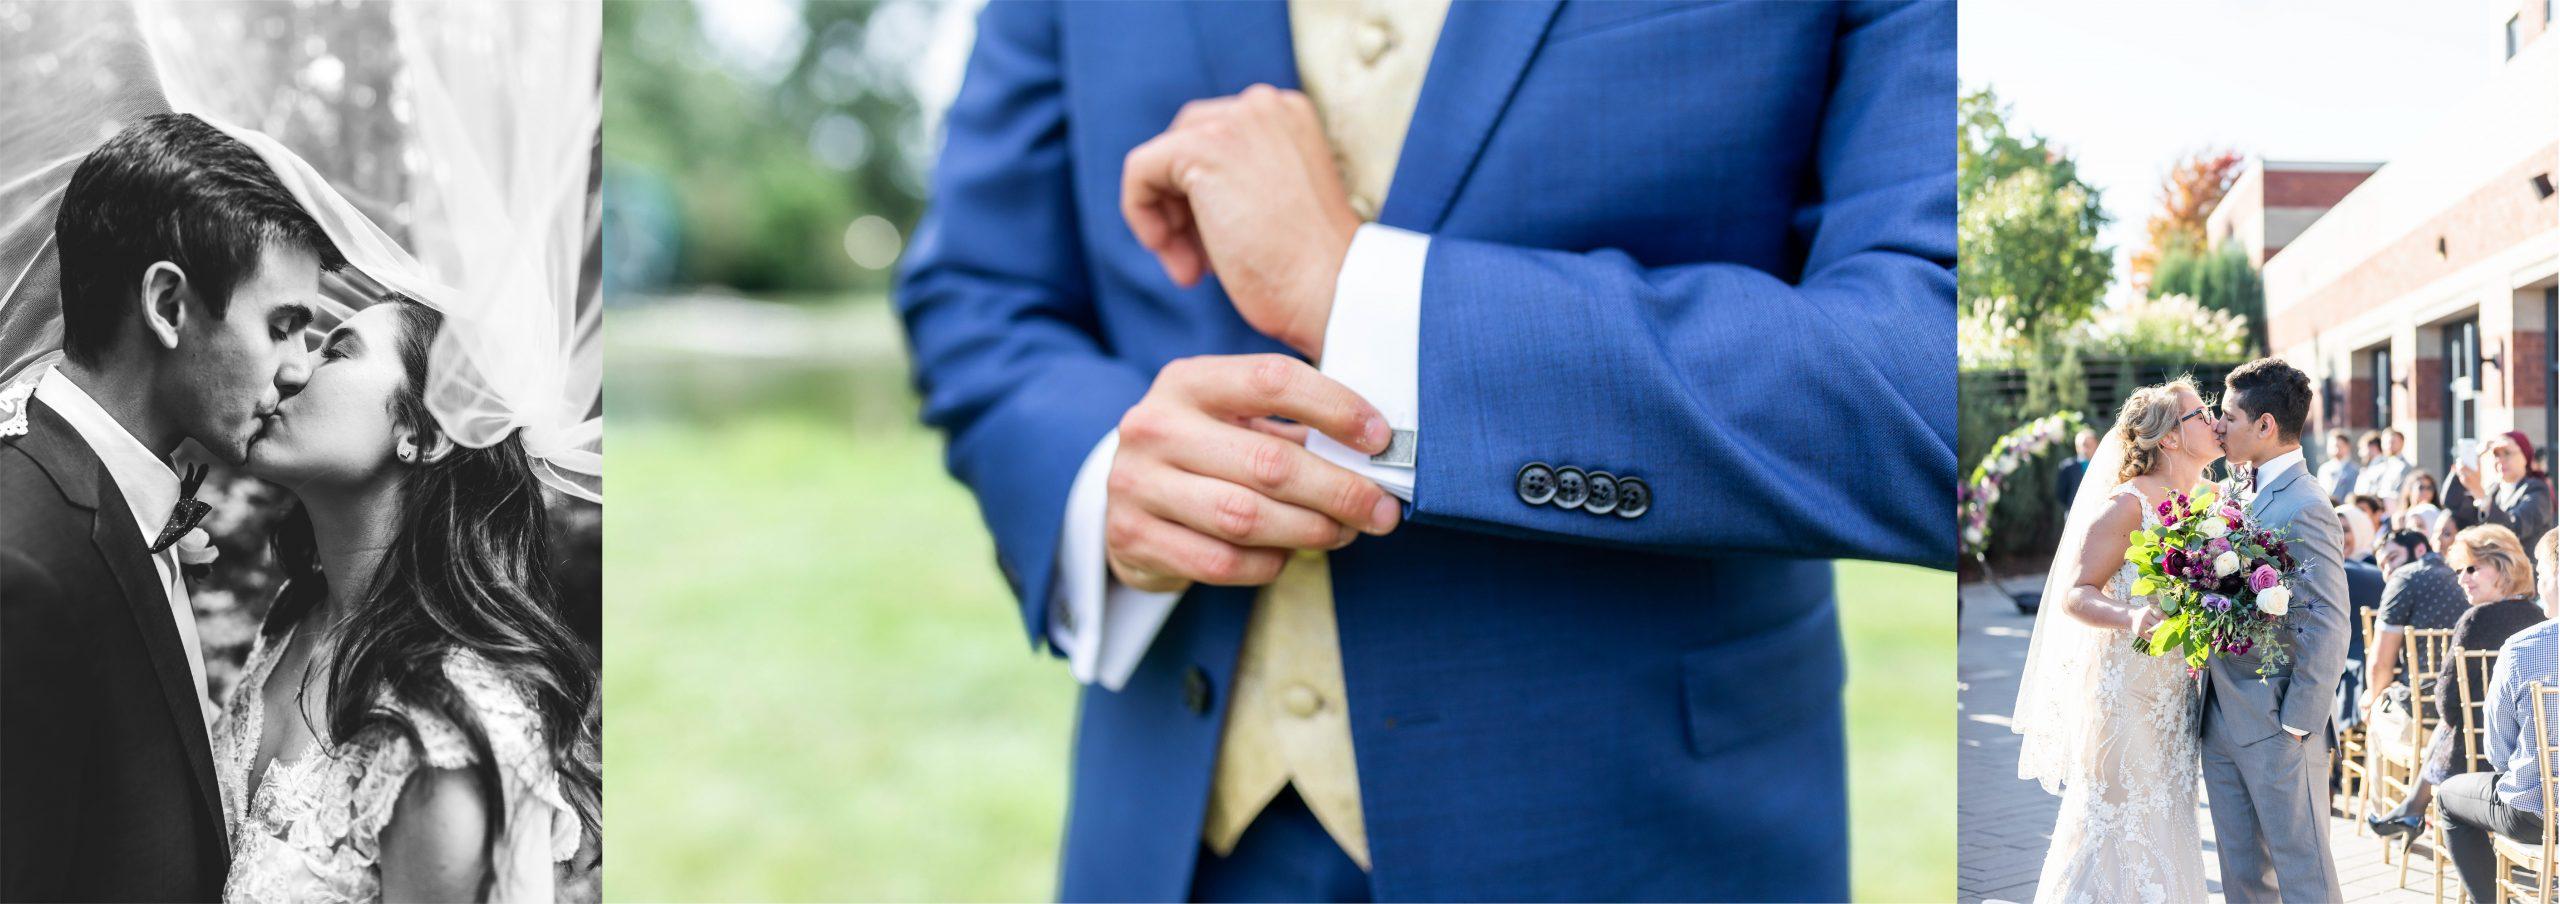 kandra-lynn-photography-michigan-wedding-photographer-16